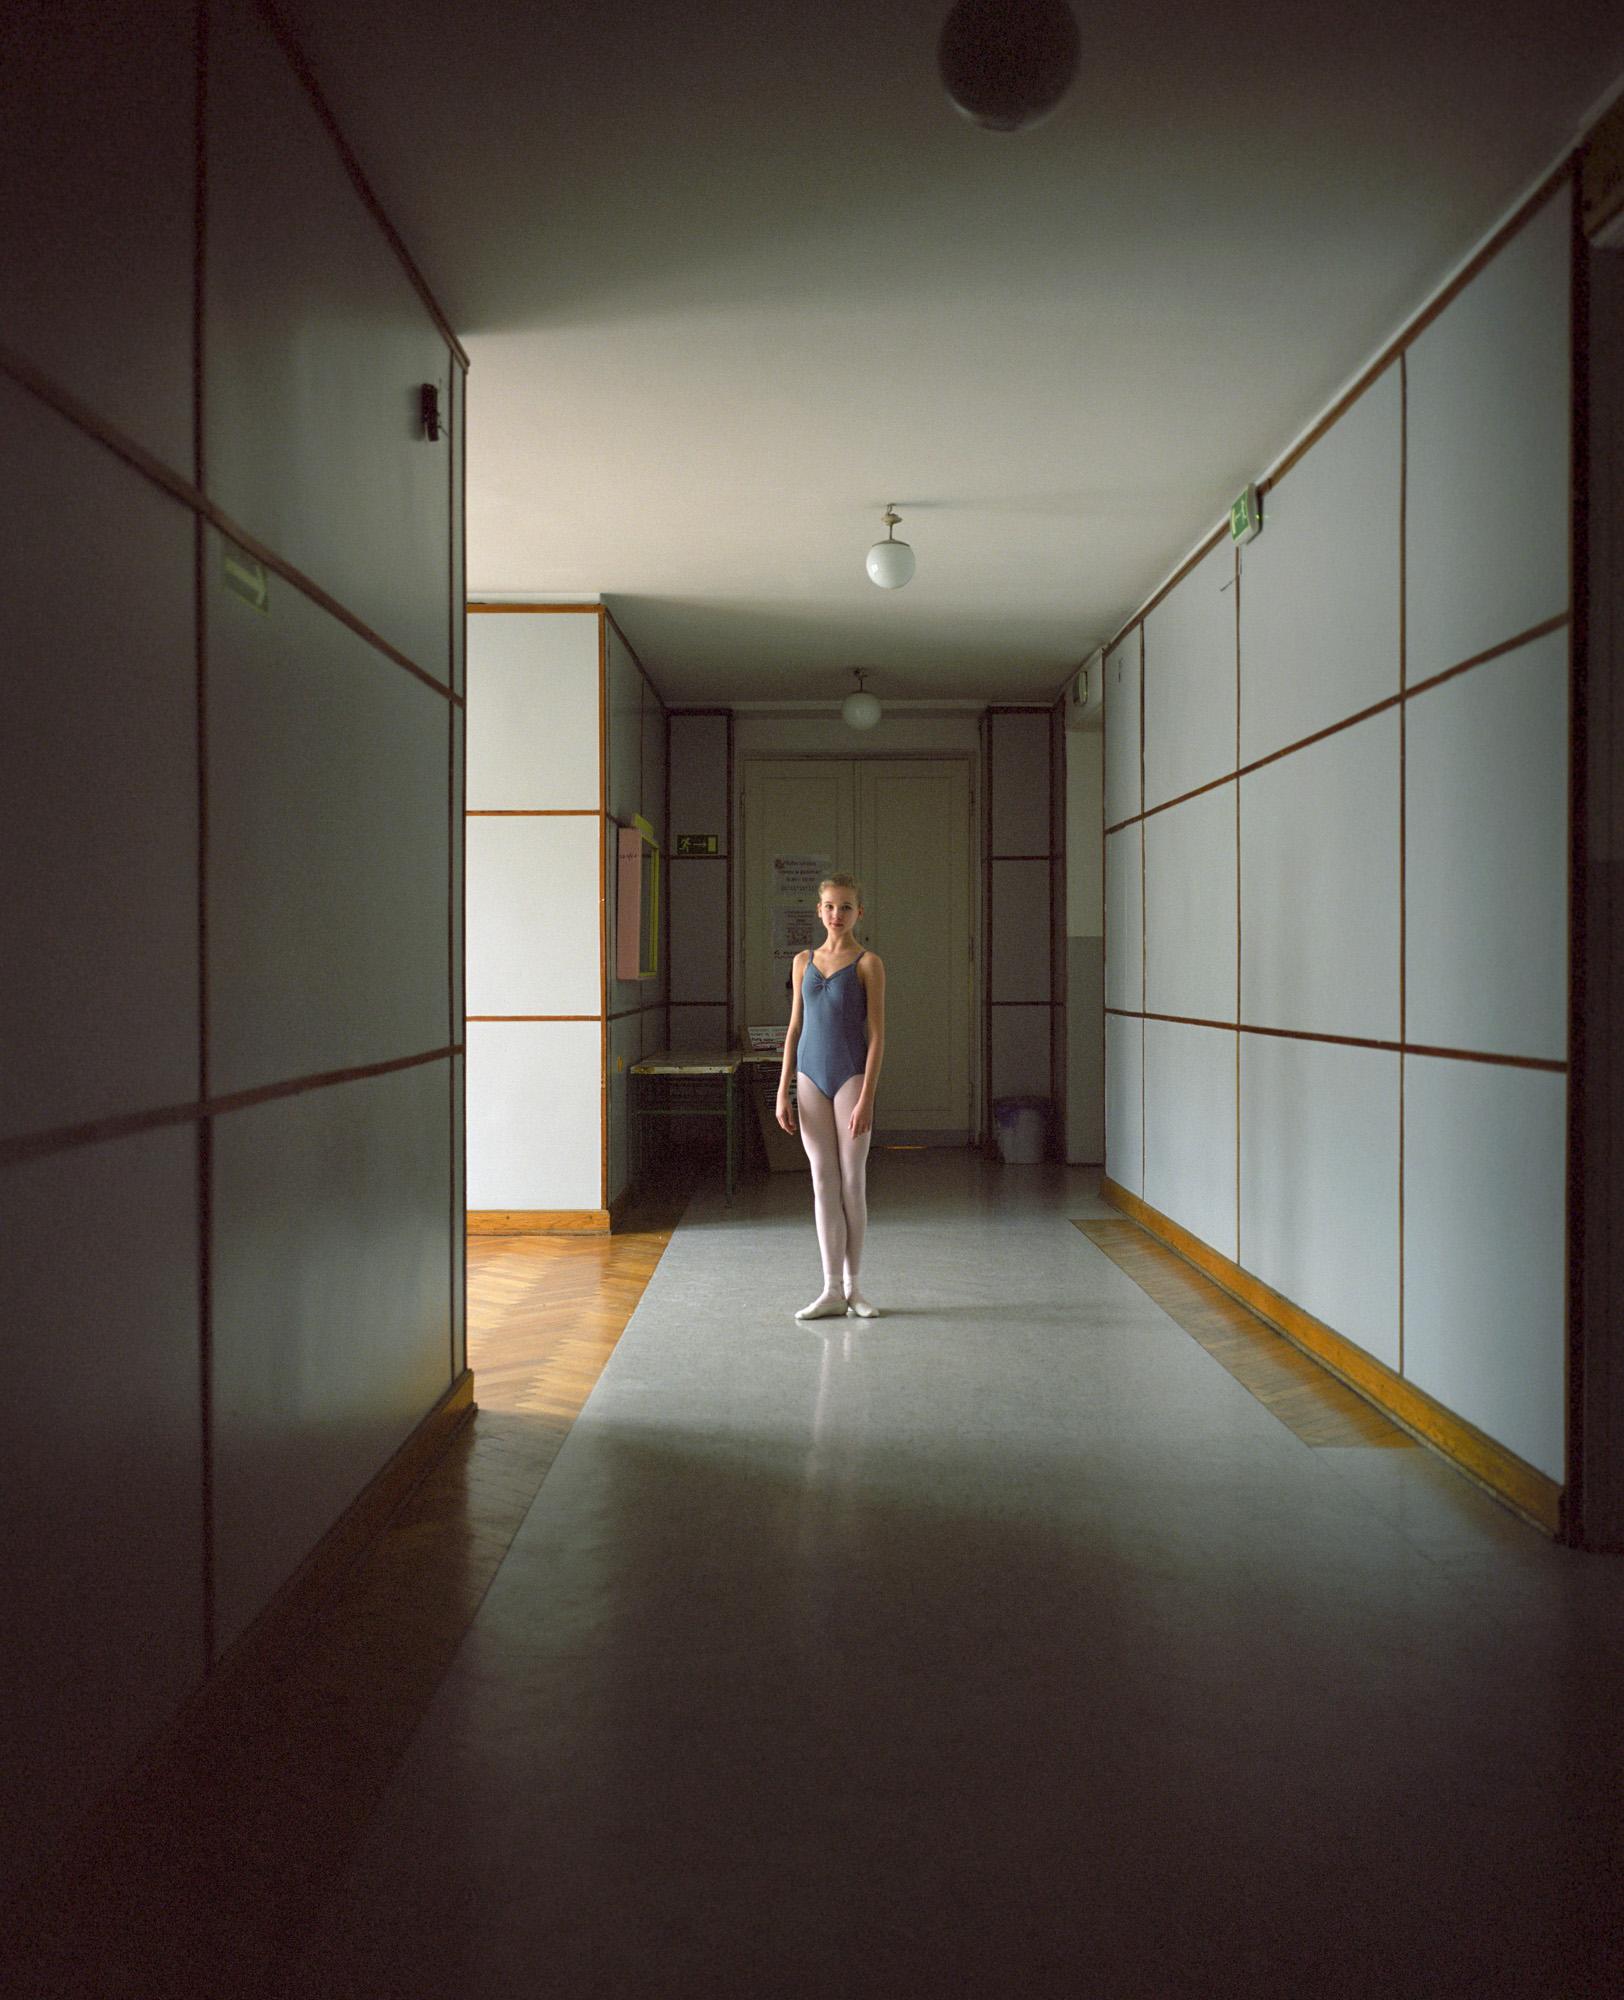 Warsaw Ballet School